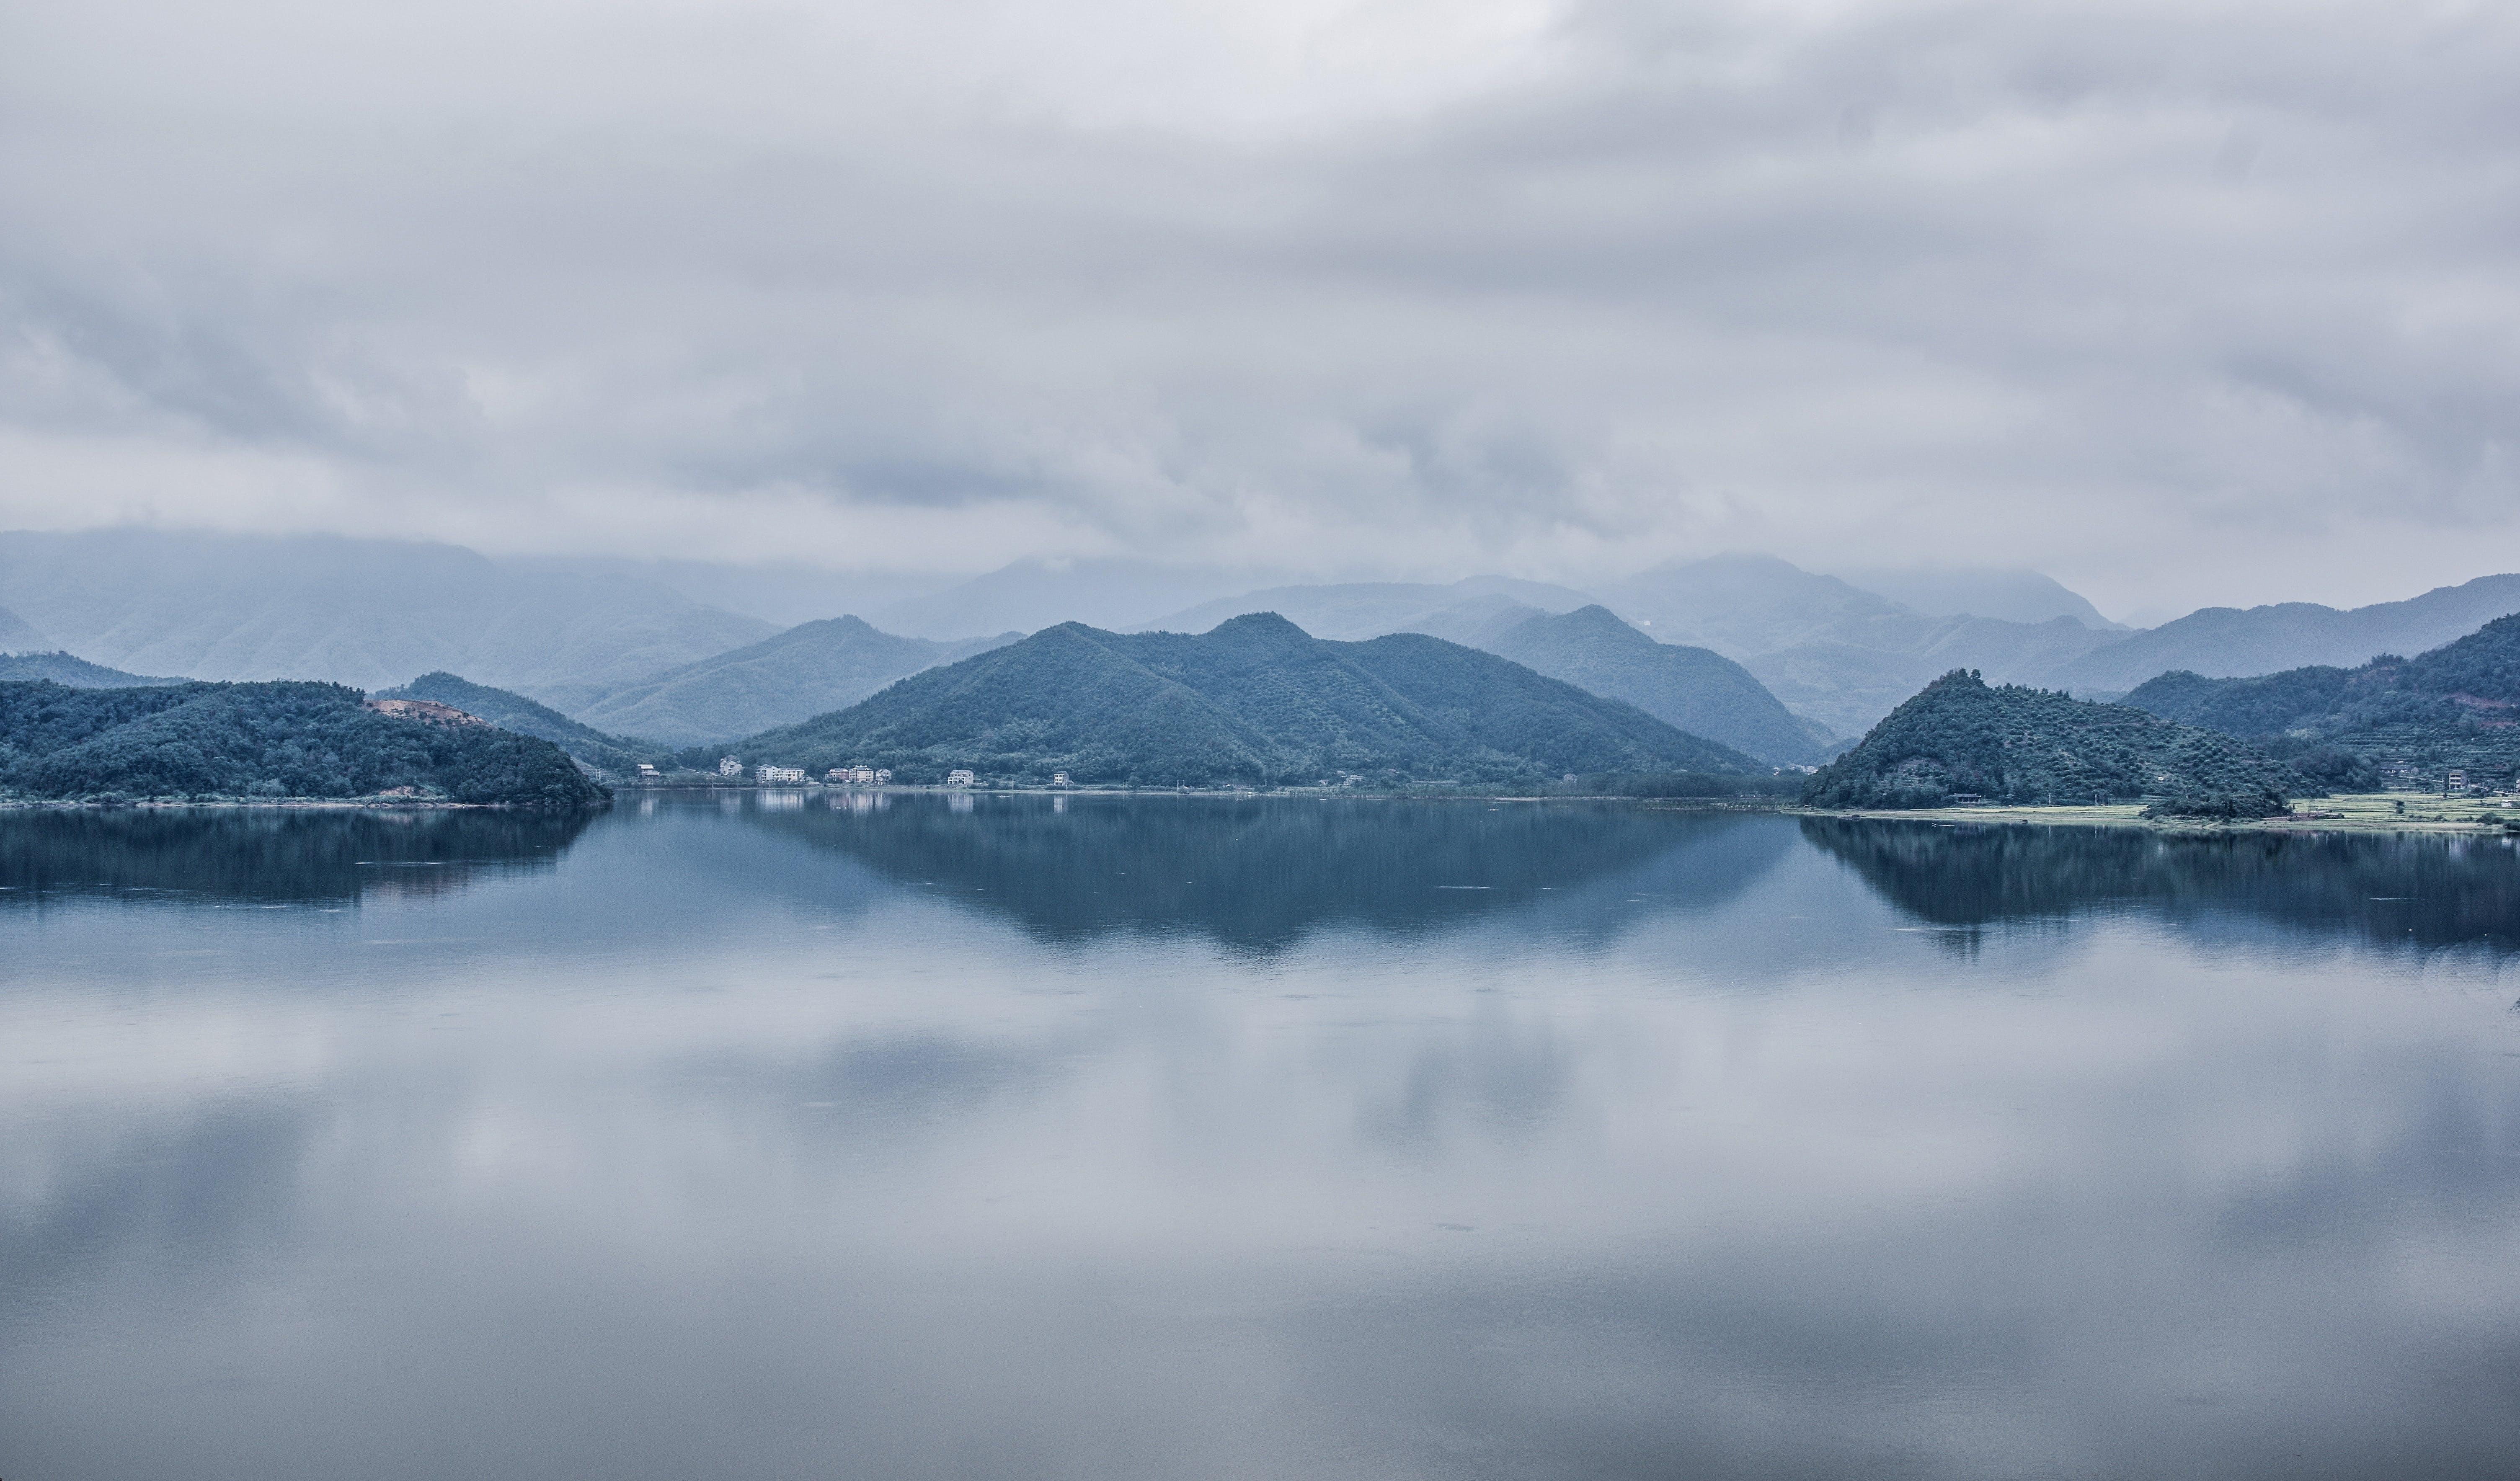 Free stock photo of landscape, nature, mountain, lake